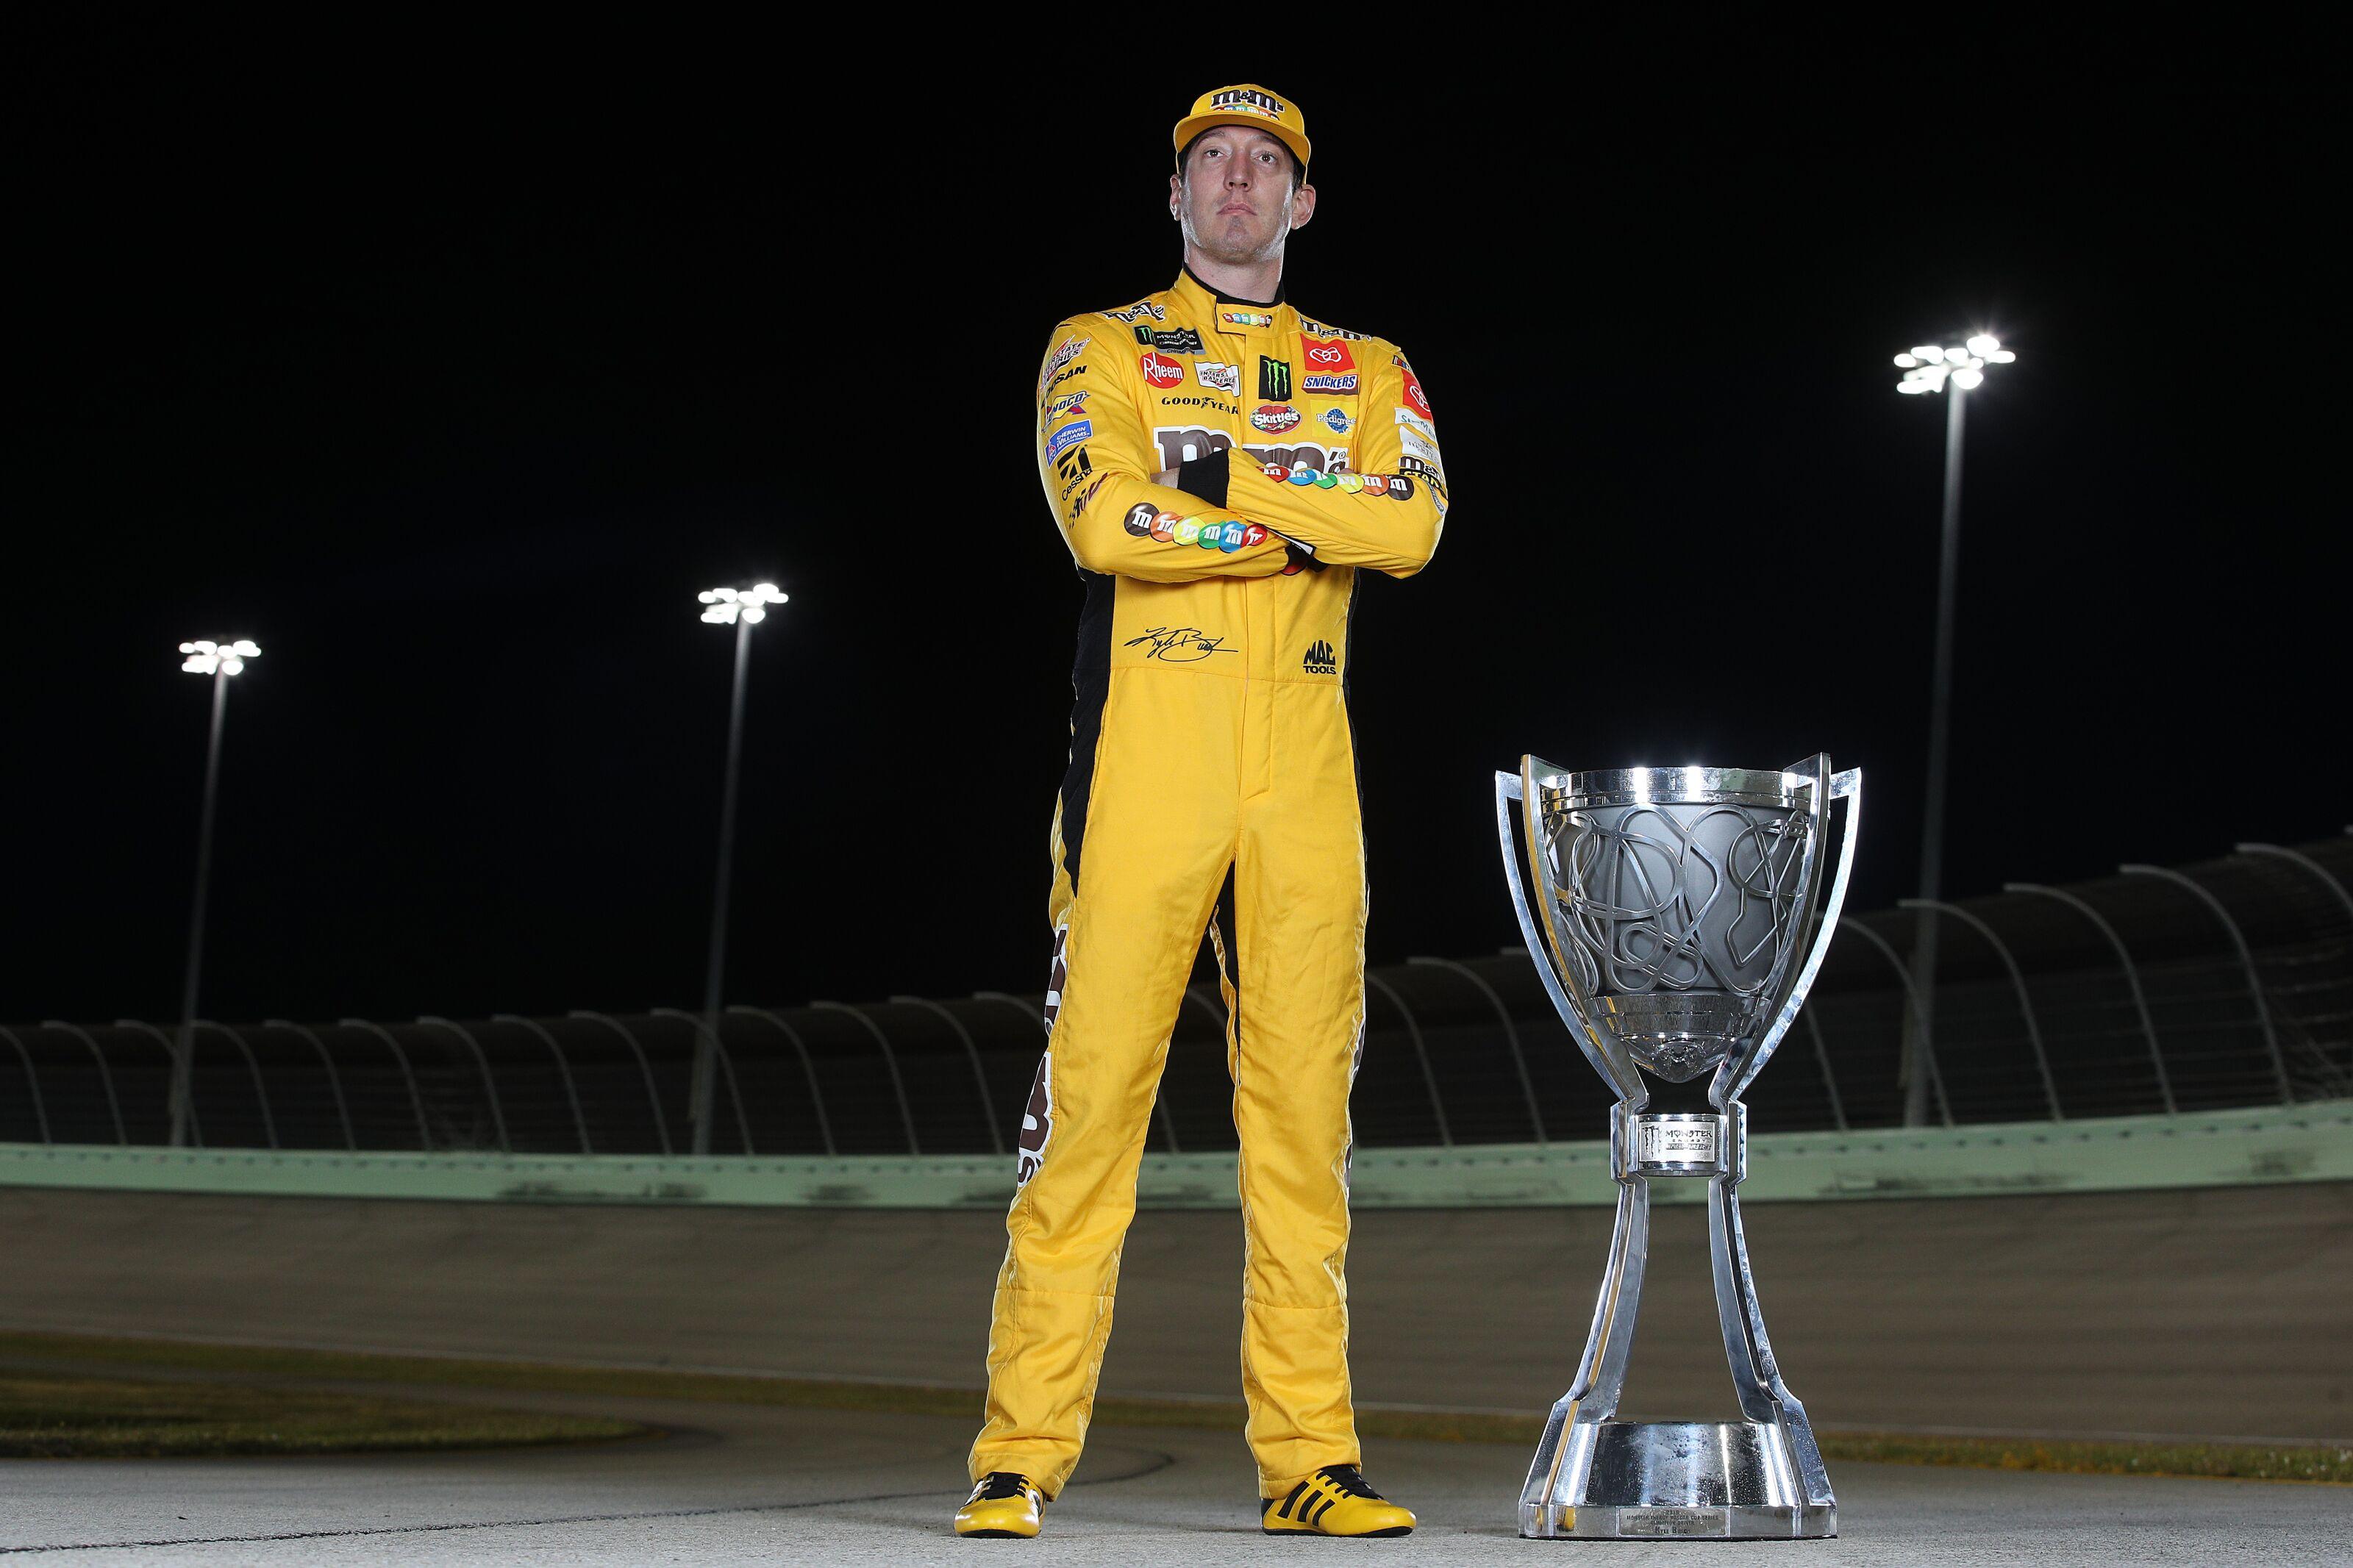 NASCAR: Kyle Busch's title season statistically the best since 2000